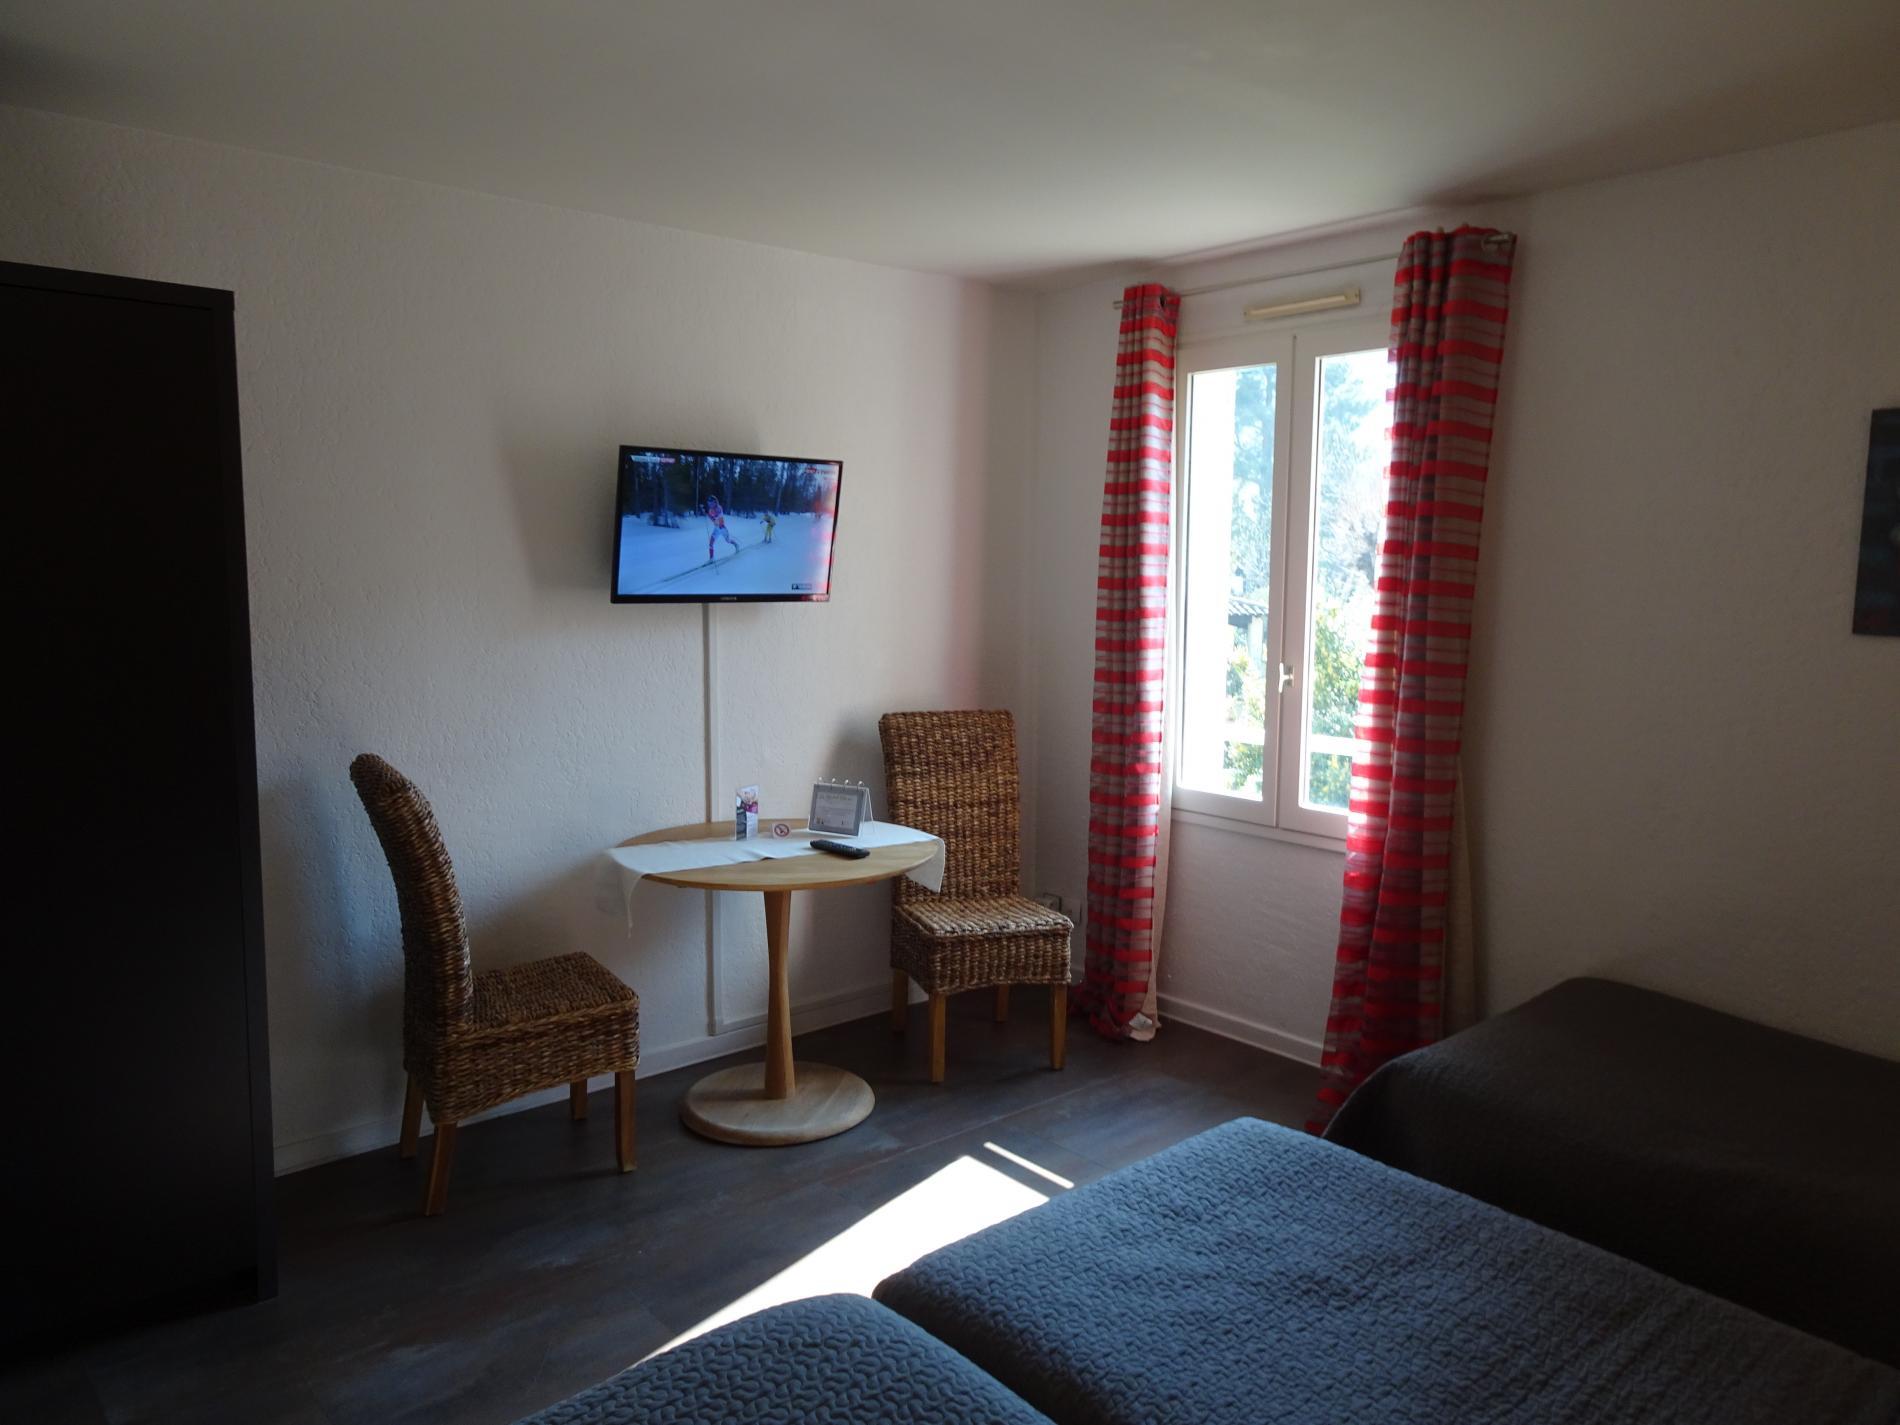 Studio trois lits simple avec kitchenette